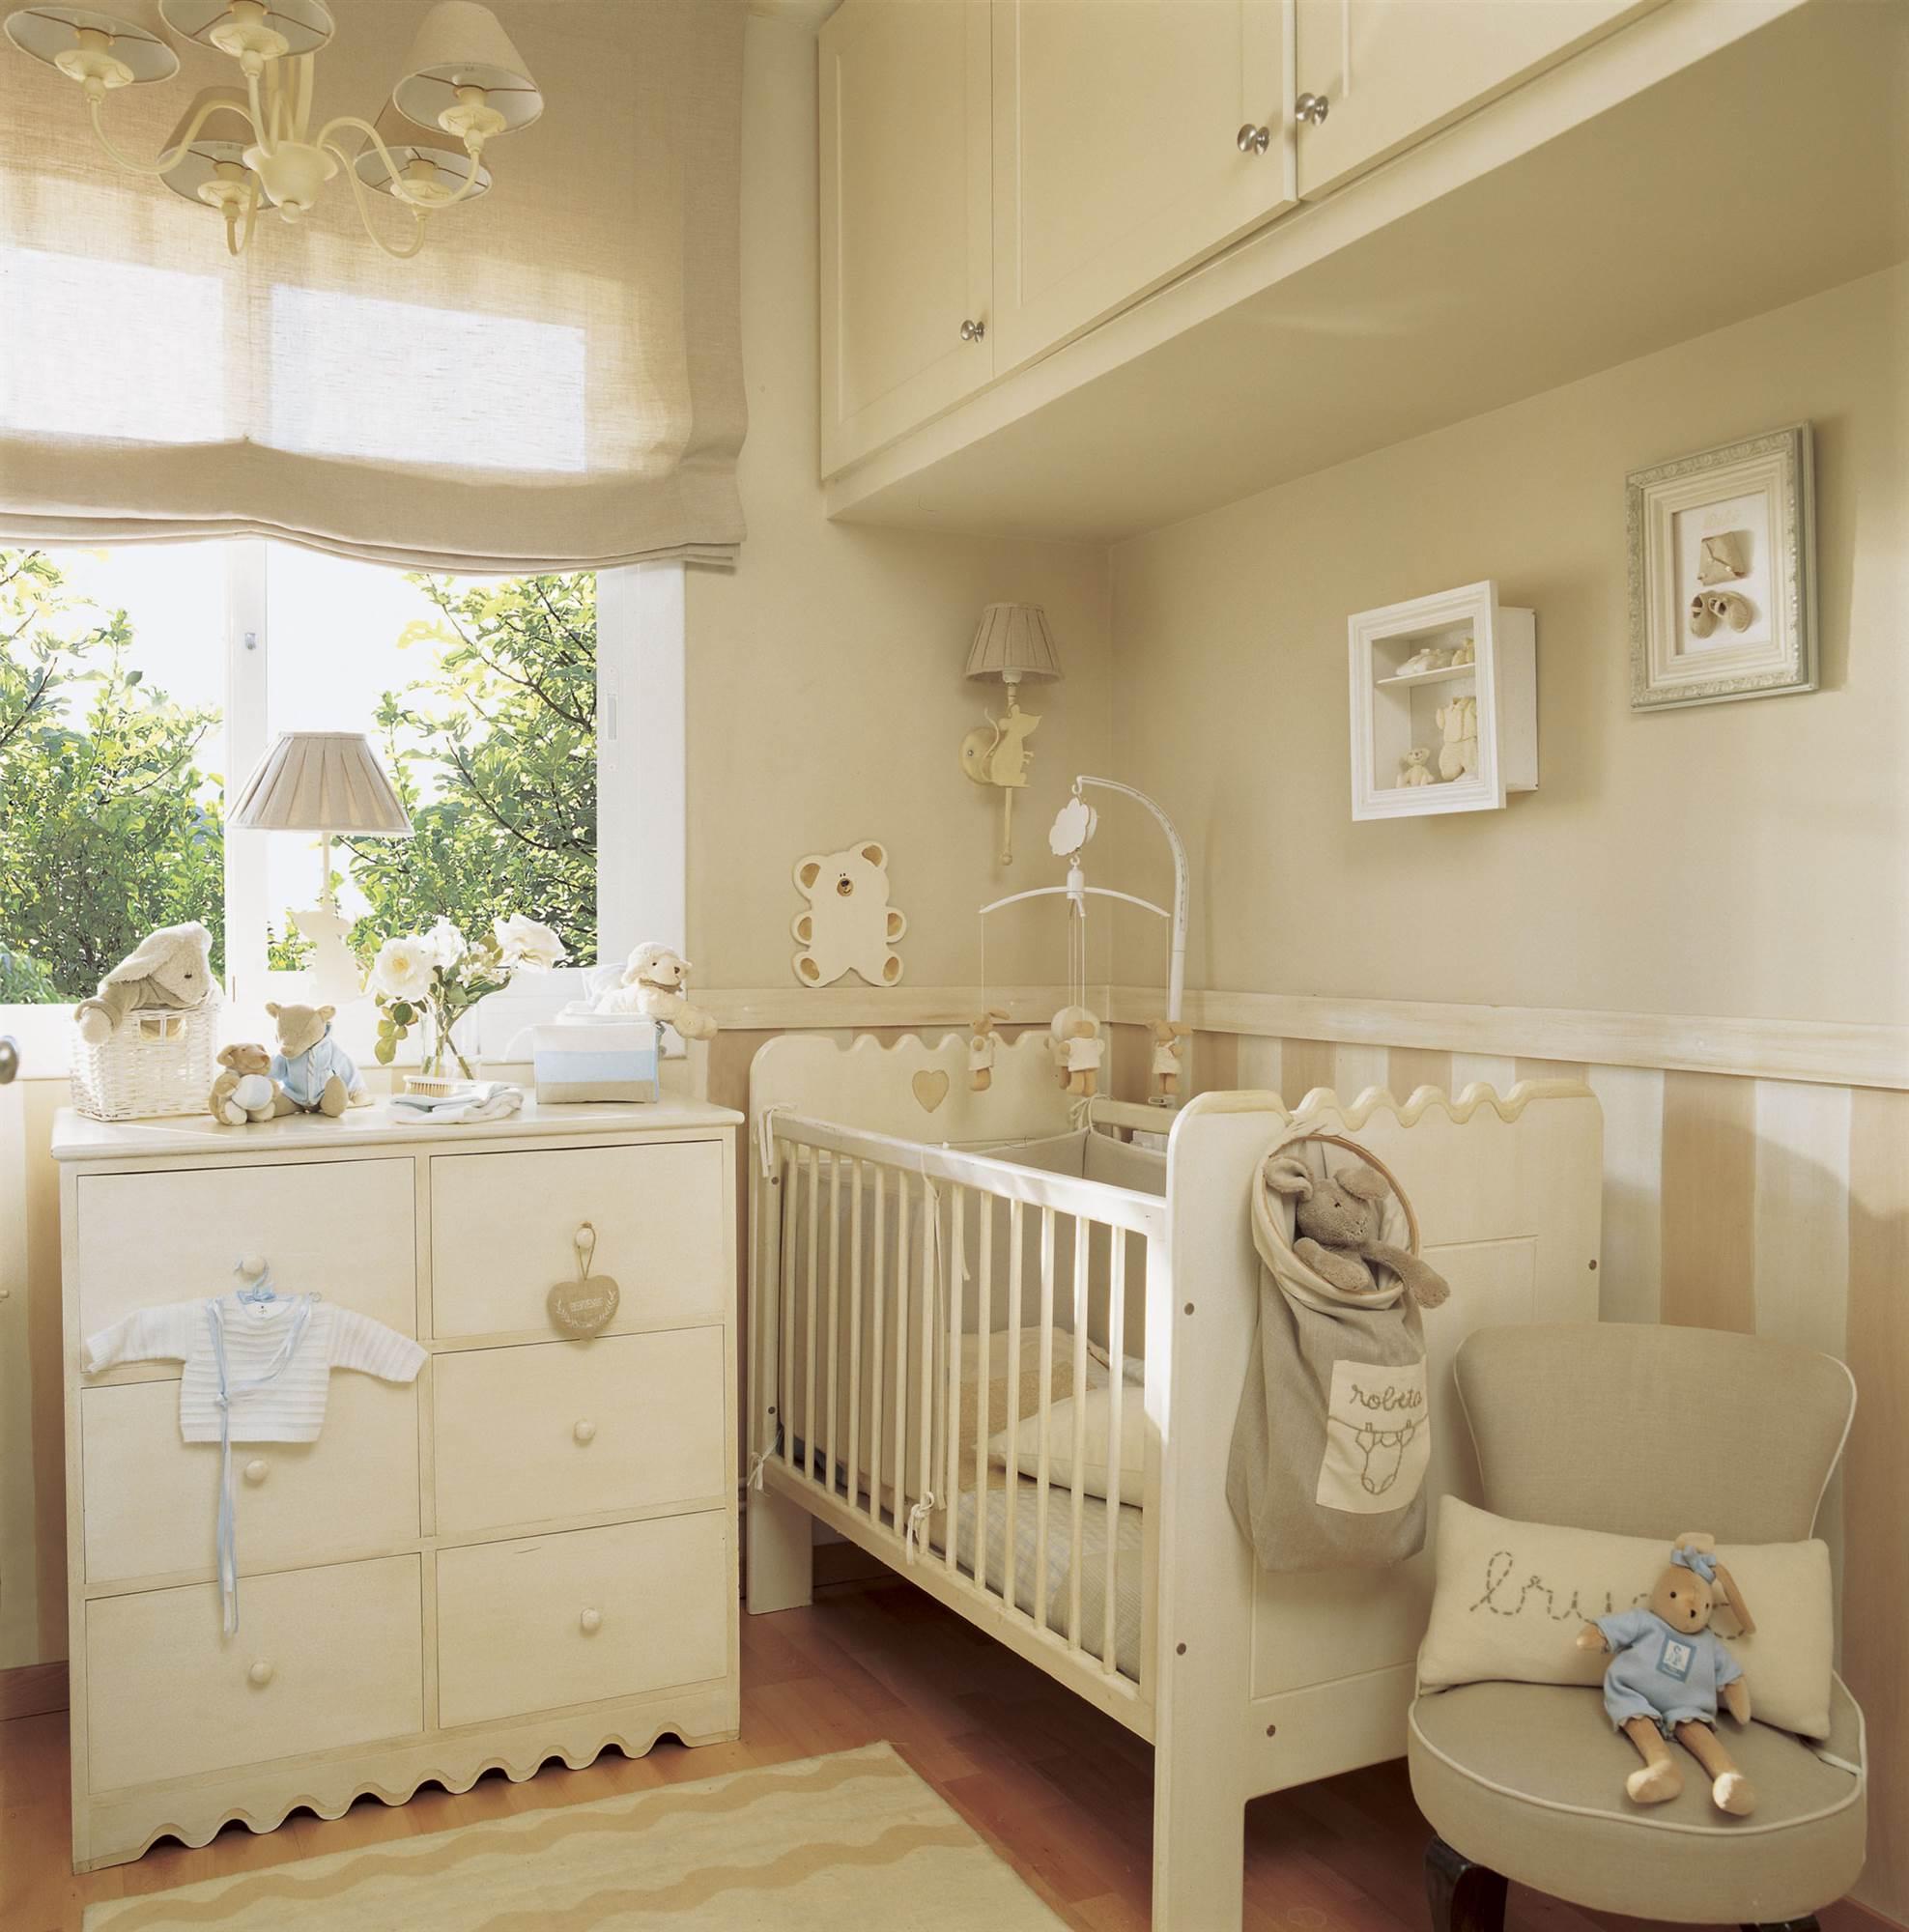 5 casas peque as bonitas ideas de decoraci n - Casas amuebladas modernas ...